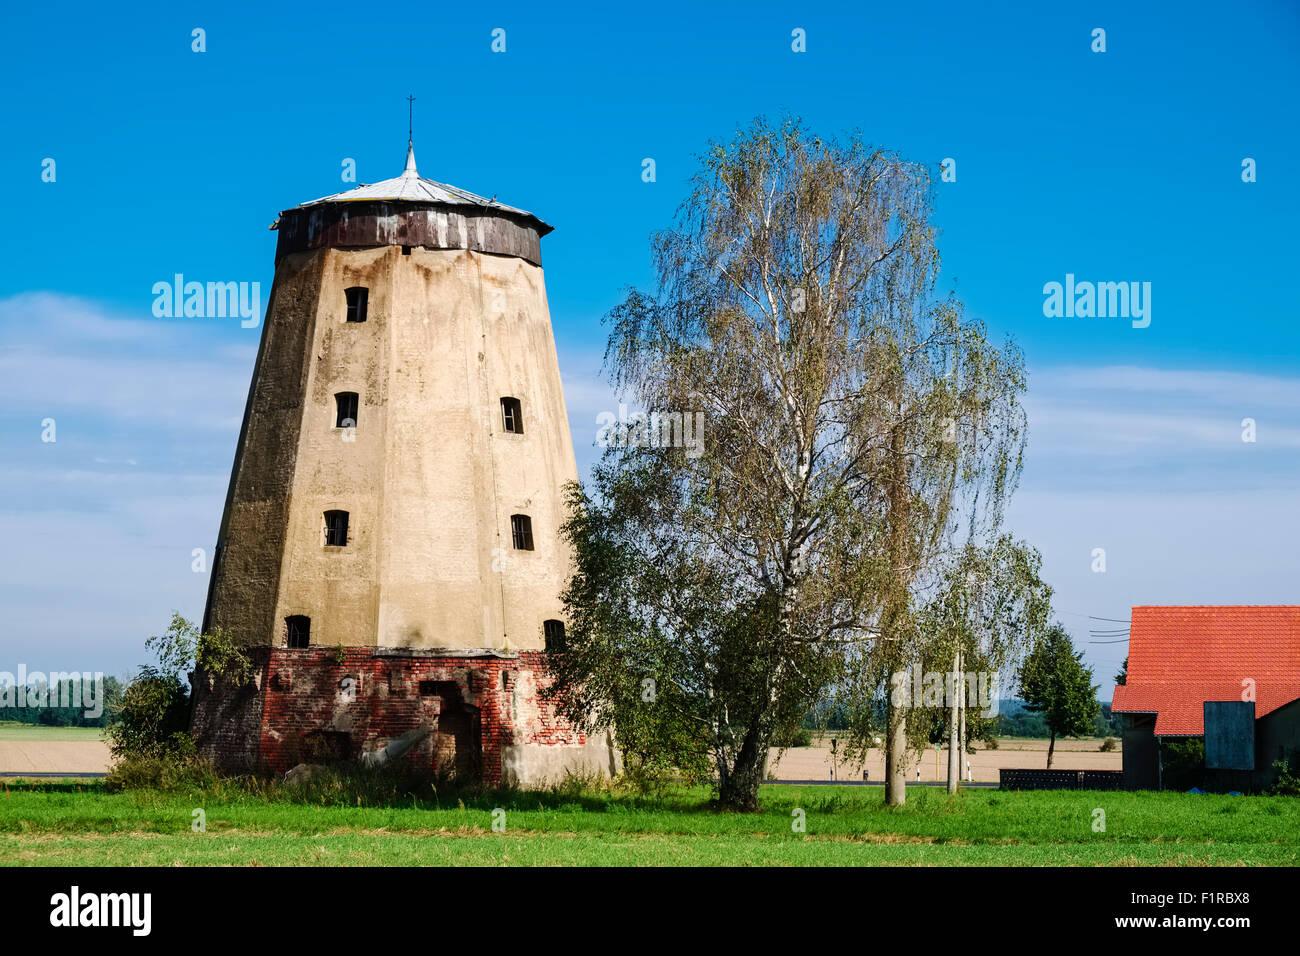 Windmill in Rosenthal near Dahme/Mark, Brandenburg, Germany - Stock Image